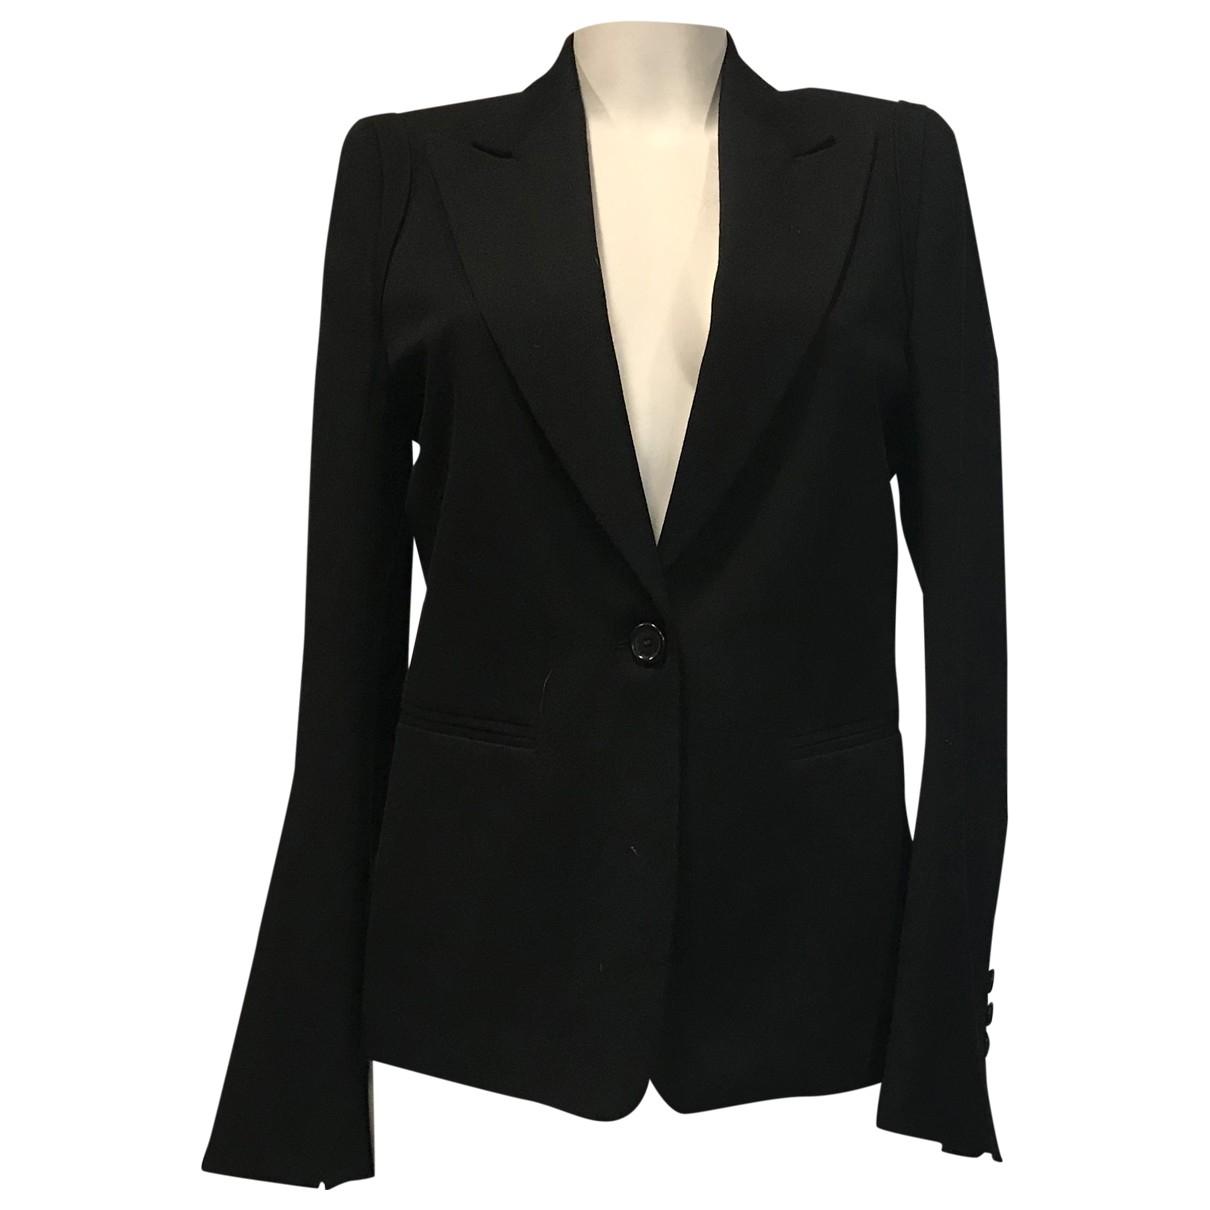 Ann Demeulemeester N Black Wool jacket for Women 38 FR